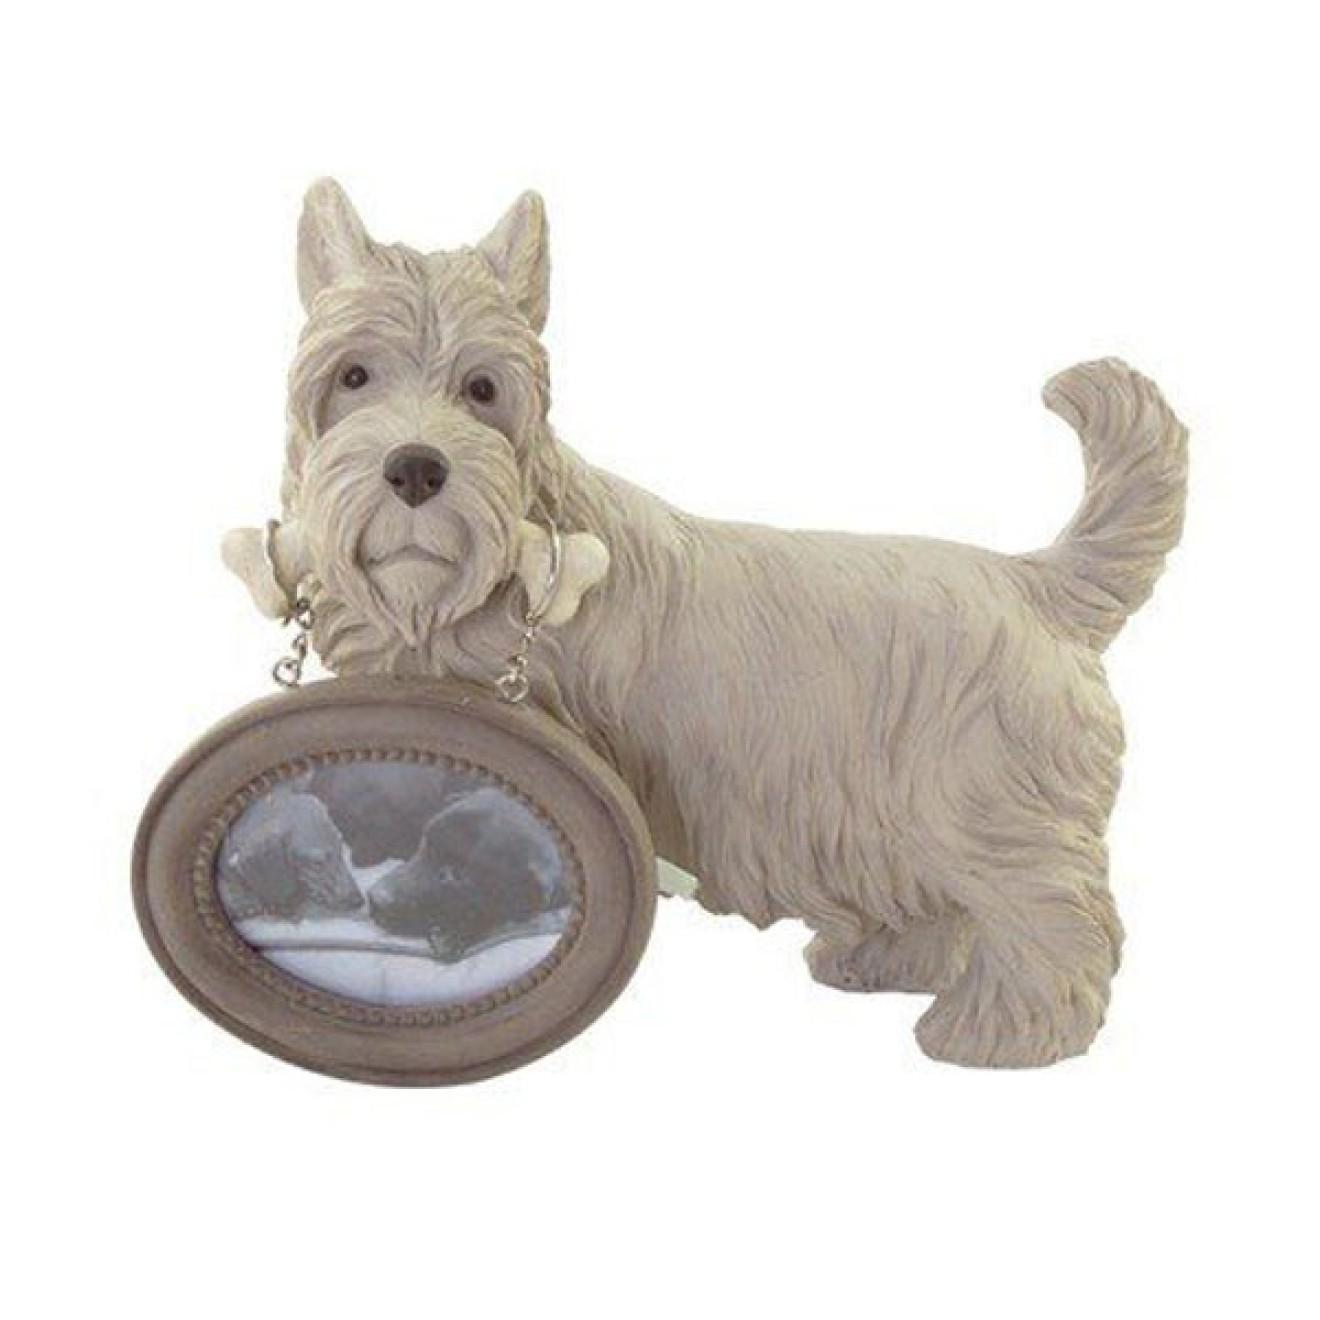 Terrier-Figur mit Bilderrahmen, Fotorahmen Hundemotiv